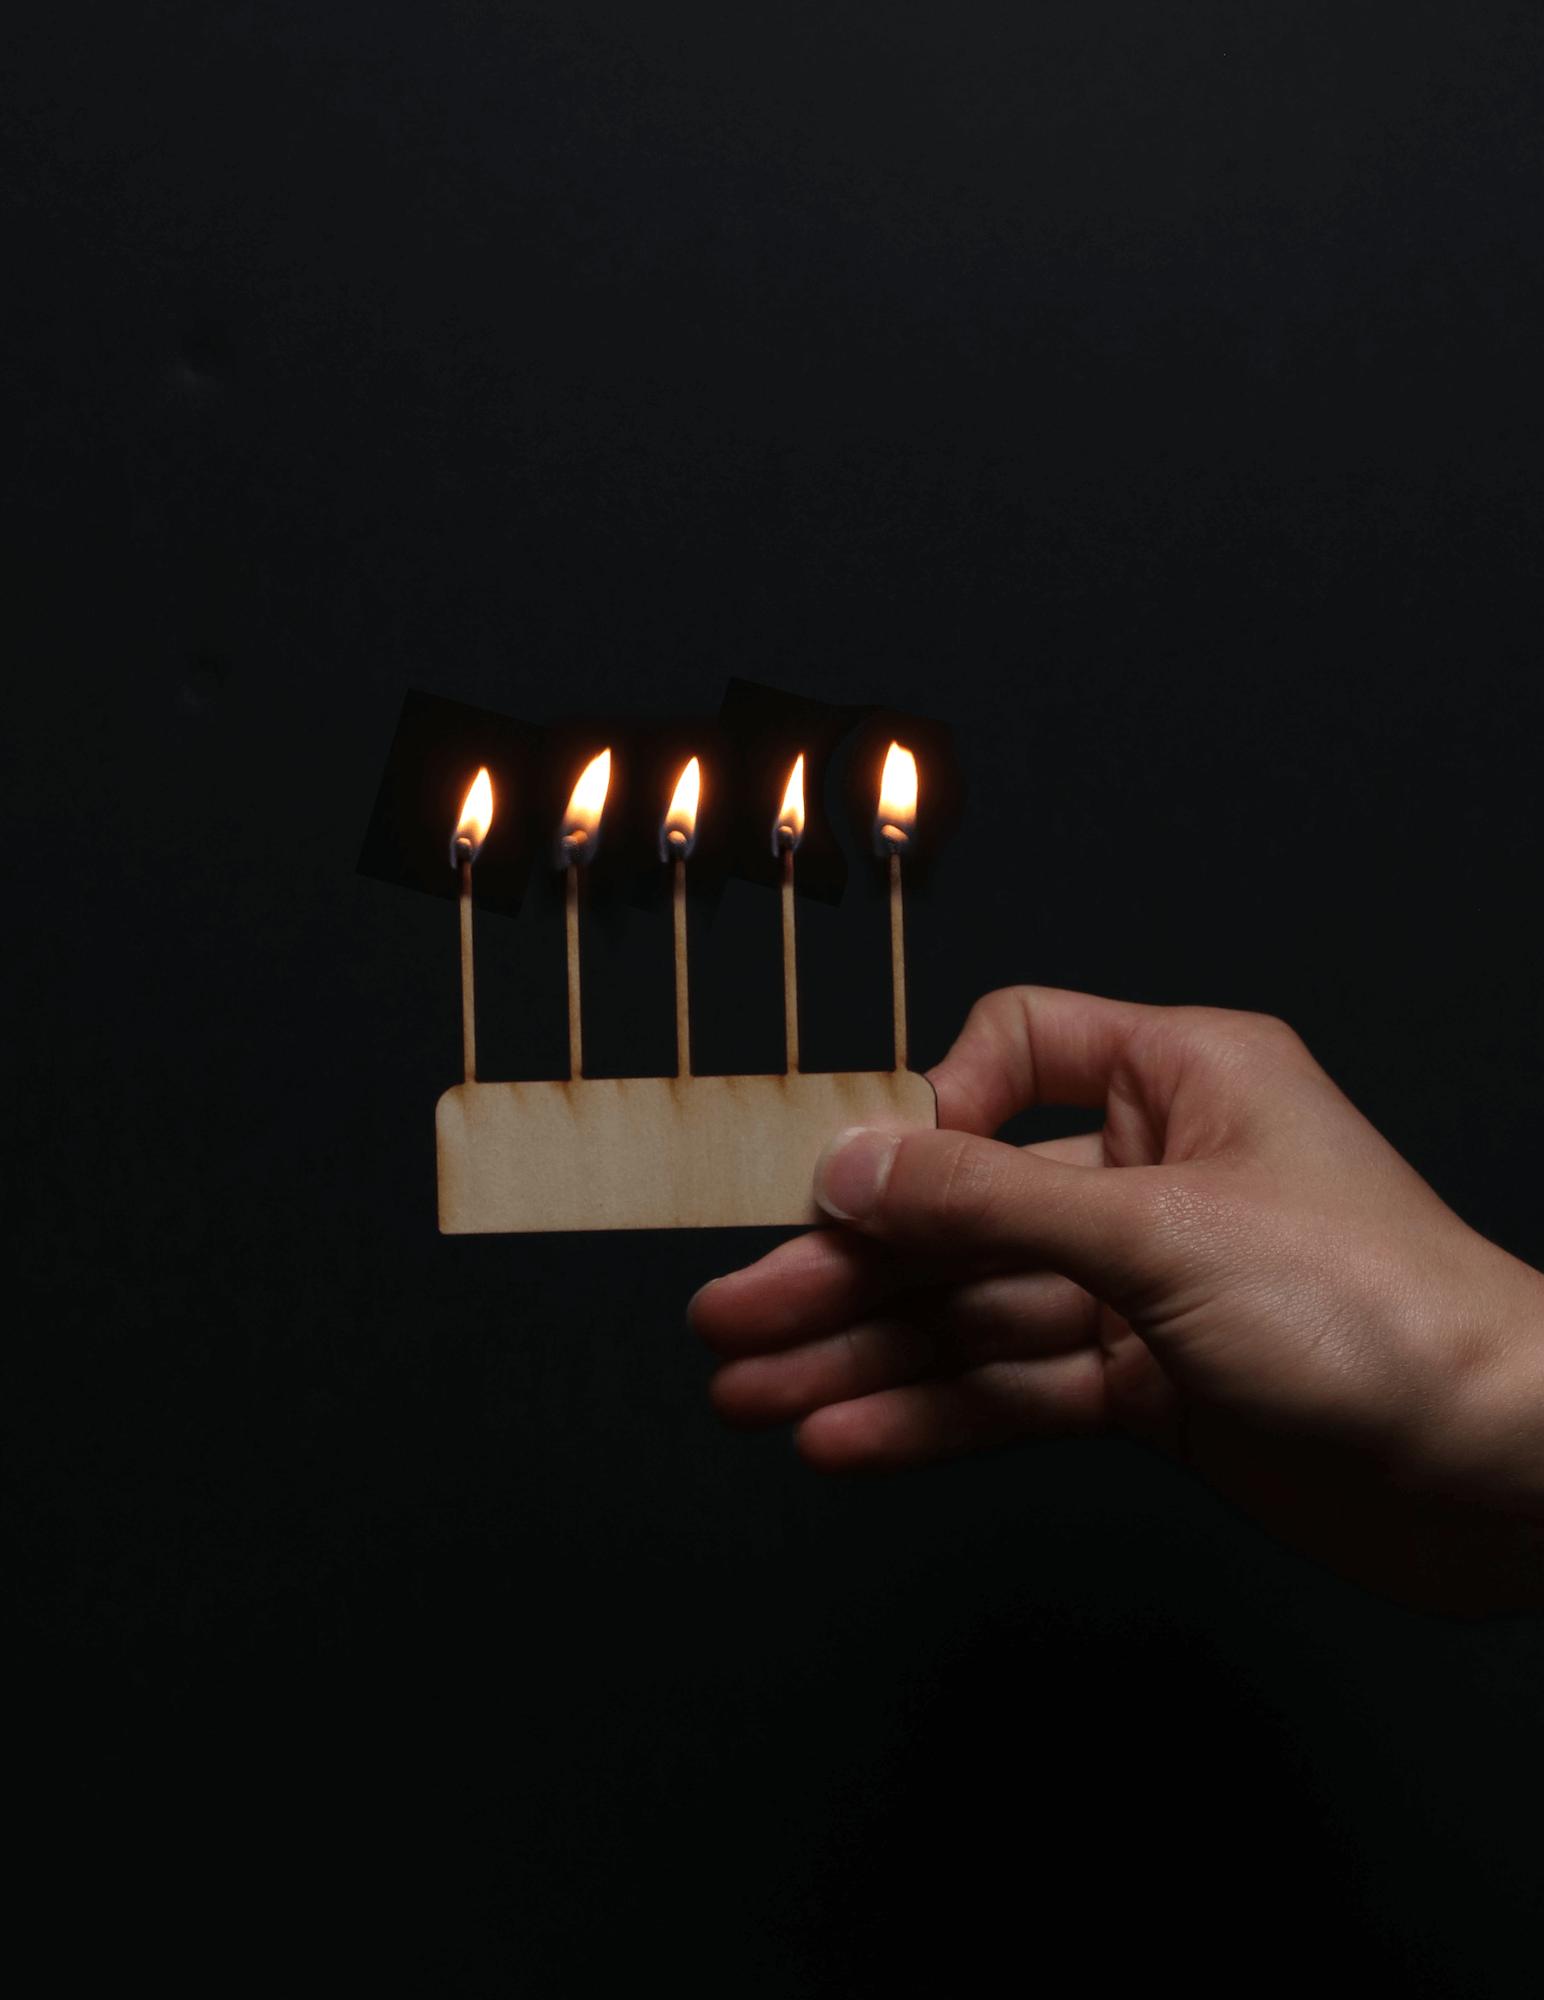 cake-match-2 small.png